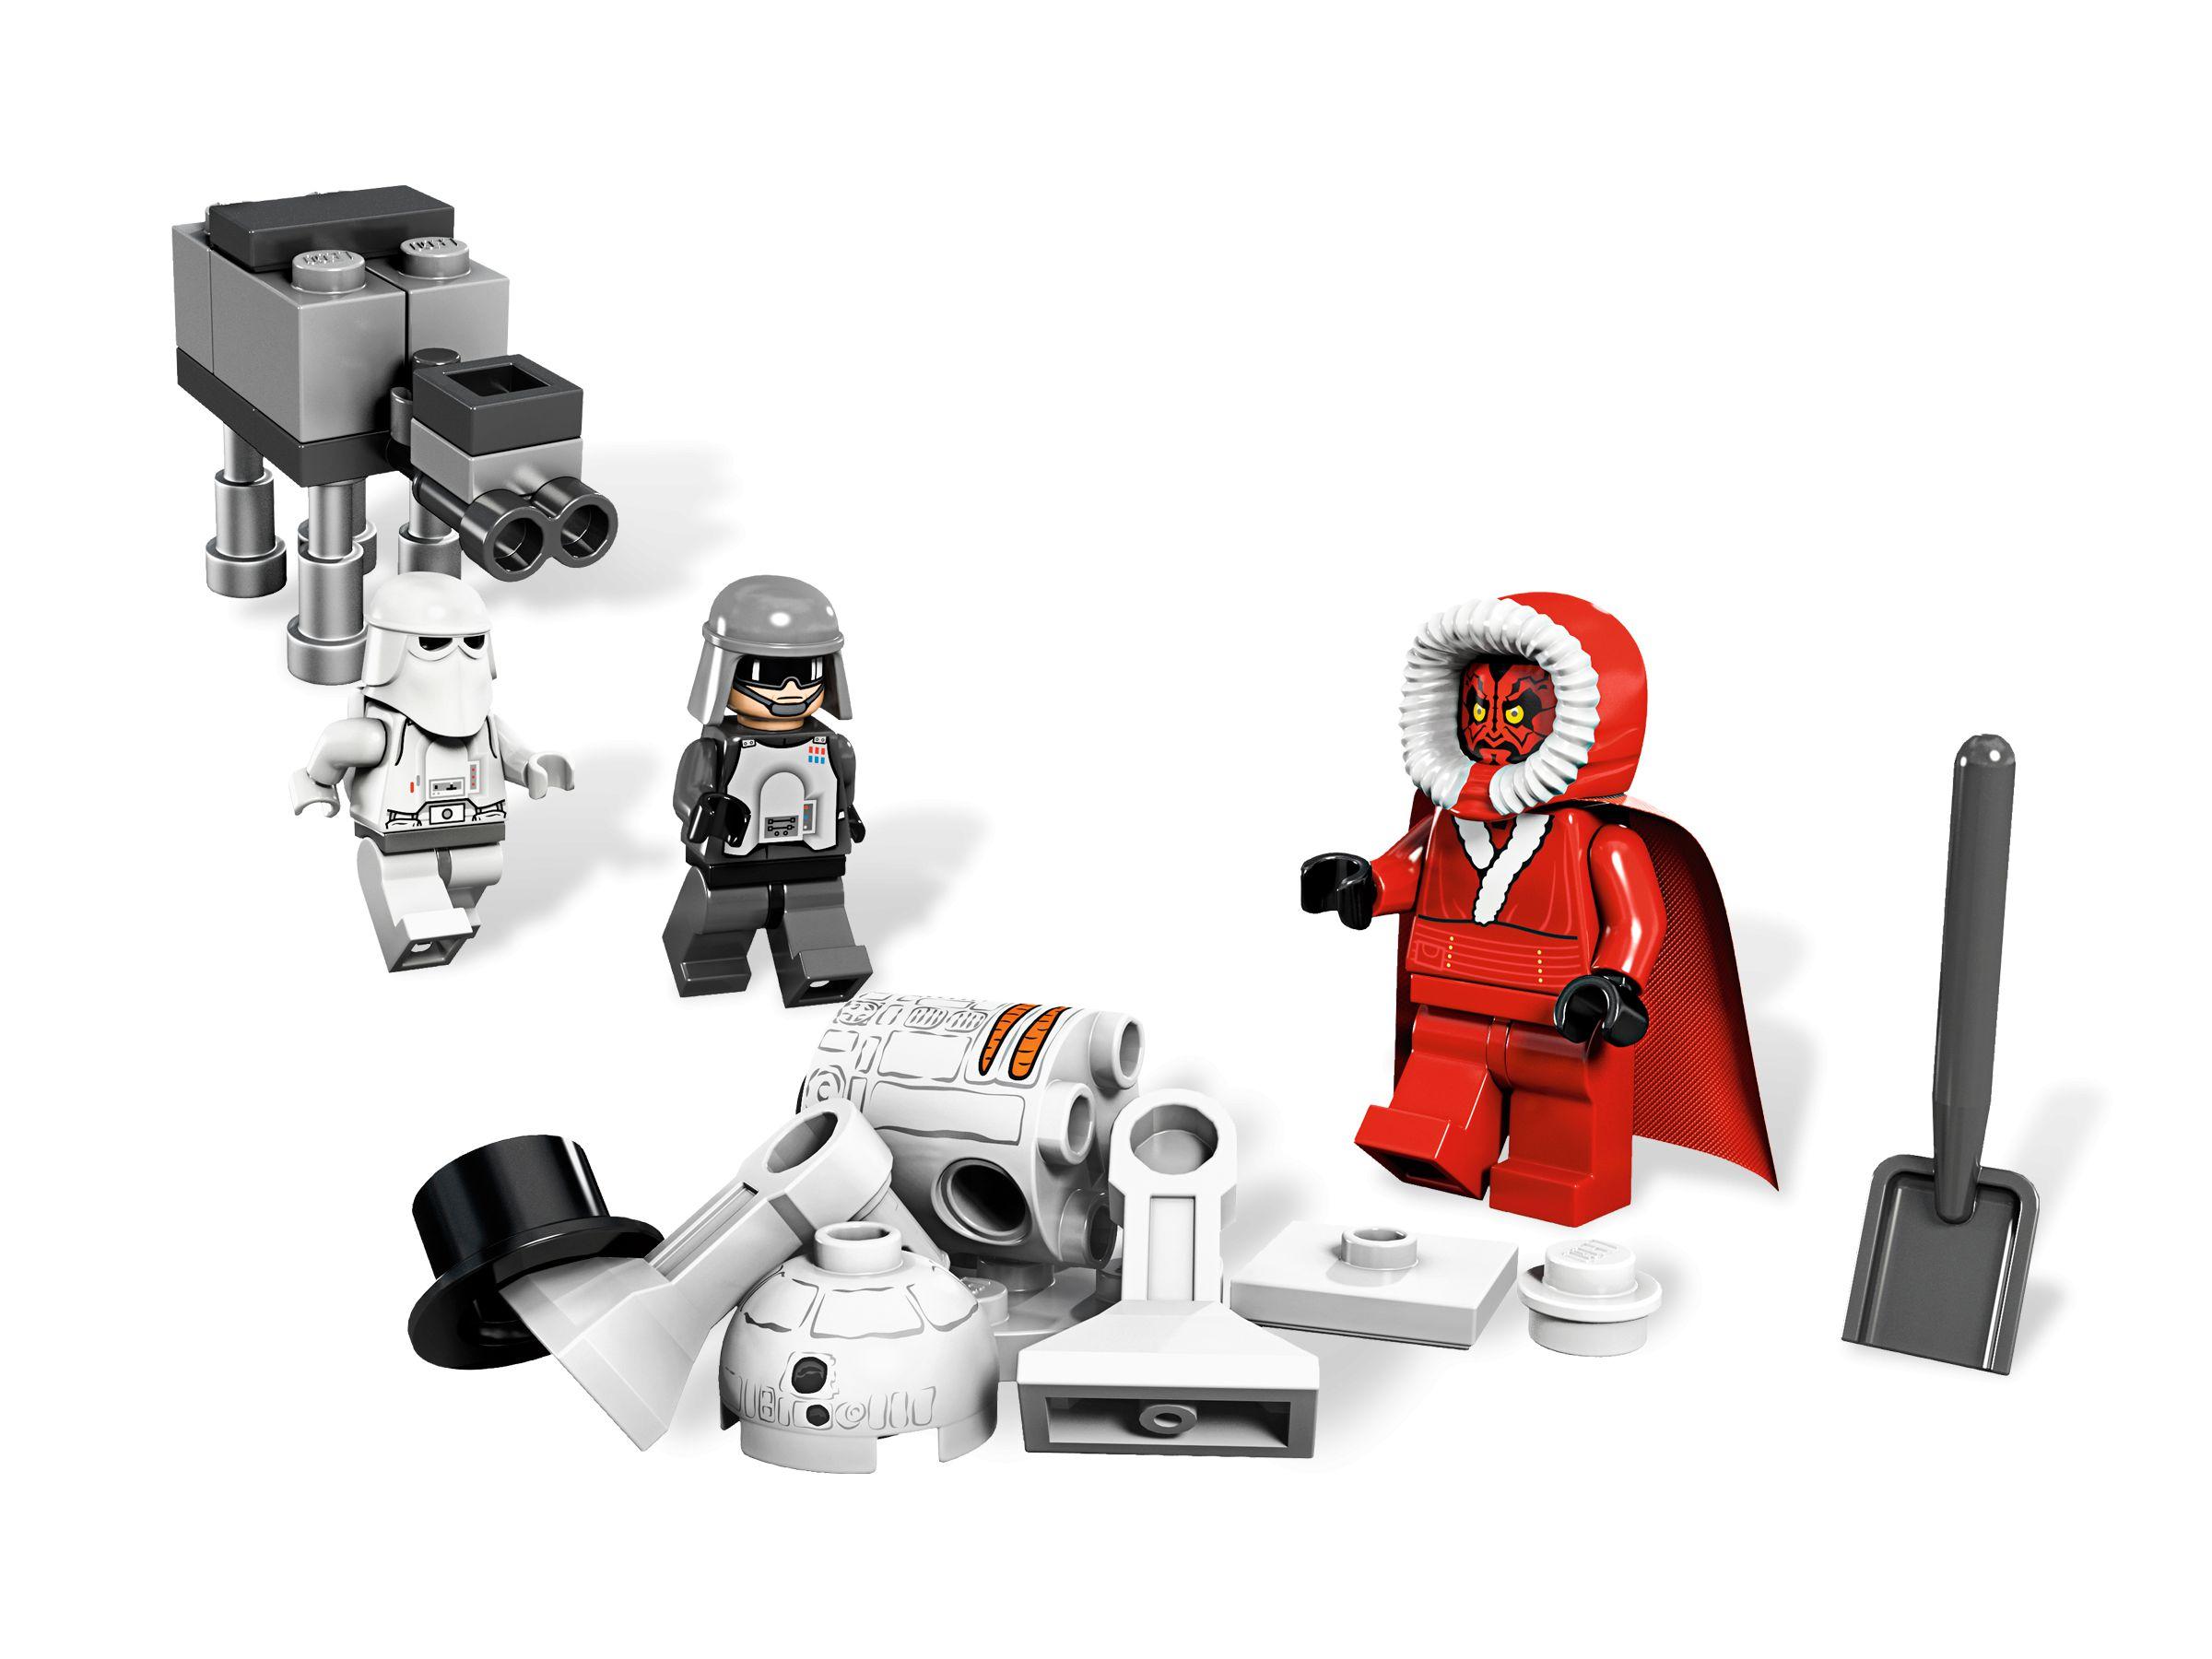 lego 9509 lego star wars adventskalender 2012 star wars advent calendar brickmerge. Black Bedroom Furniture Sets. Home Design Ideas